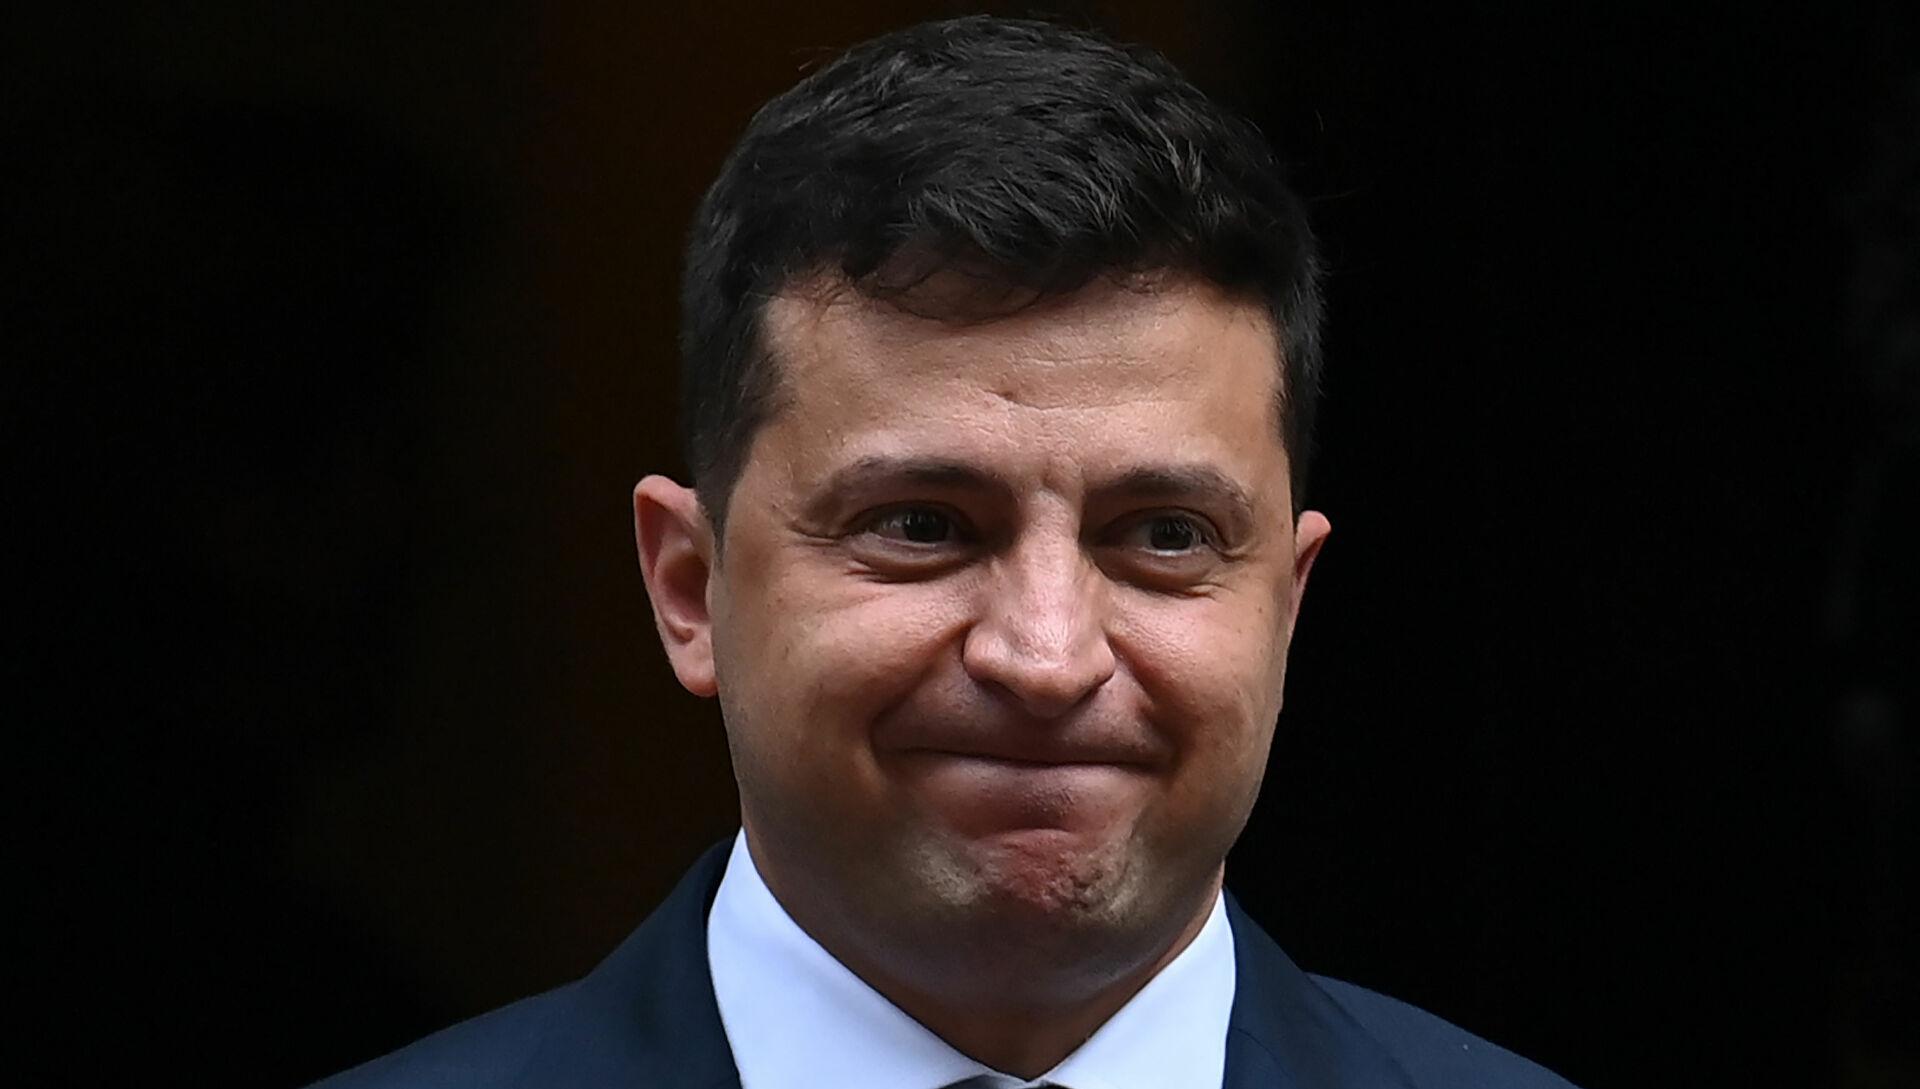 aksjonov otvetil zelenskomu na prizyv privlekat bolshe inostrannyh partnjorov na krymskuju platformu